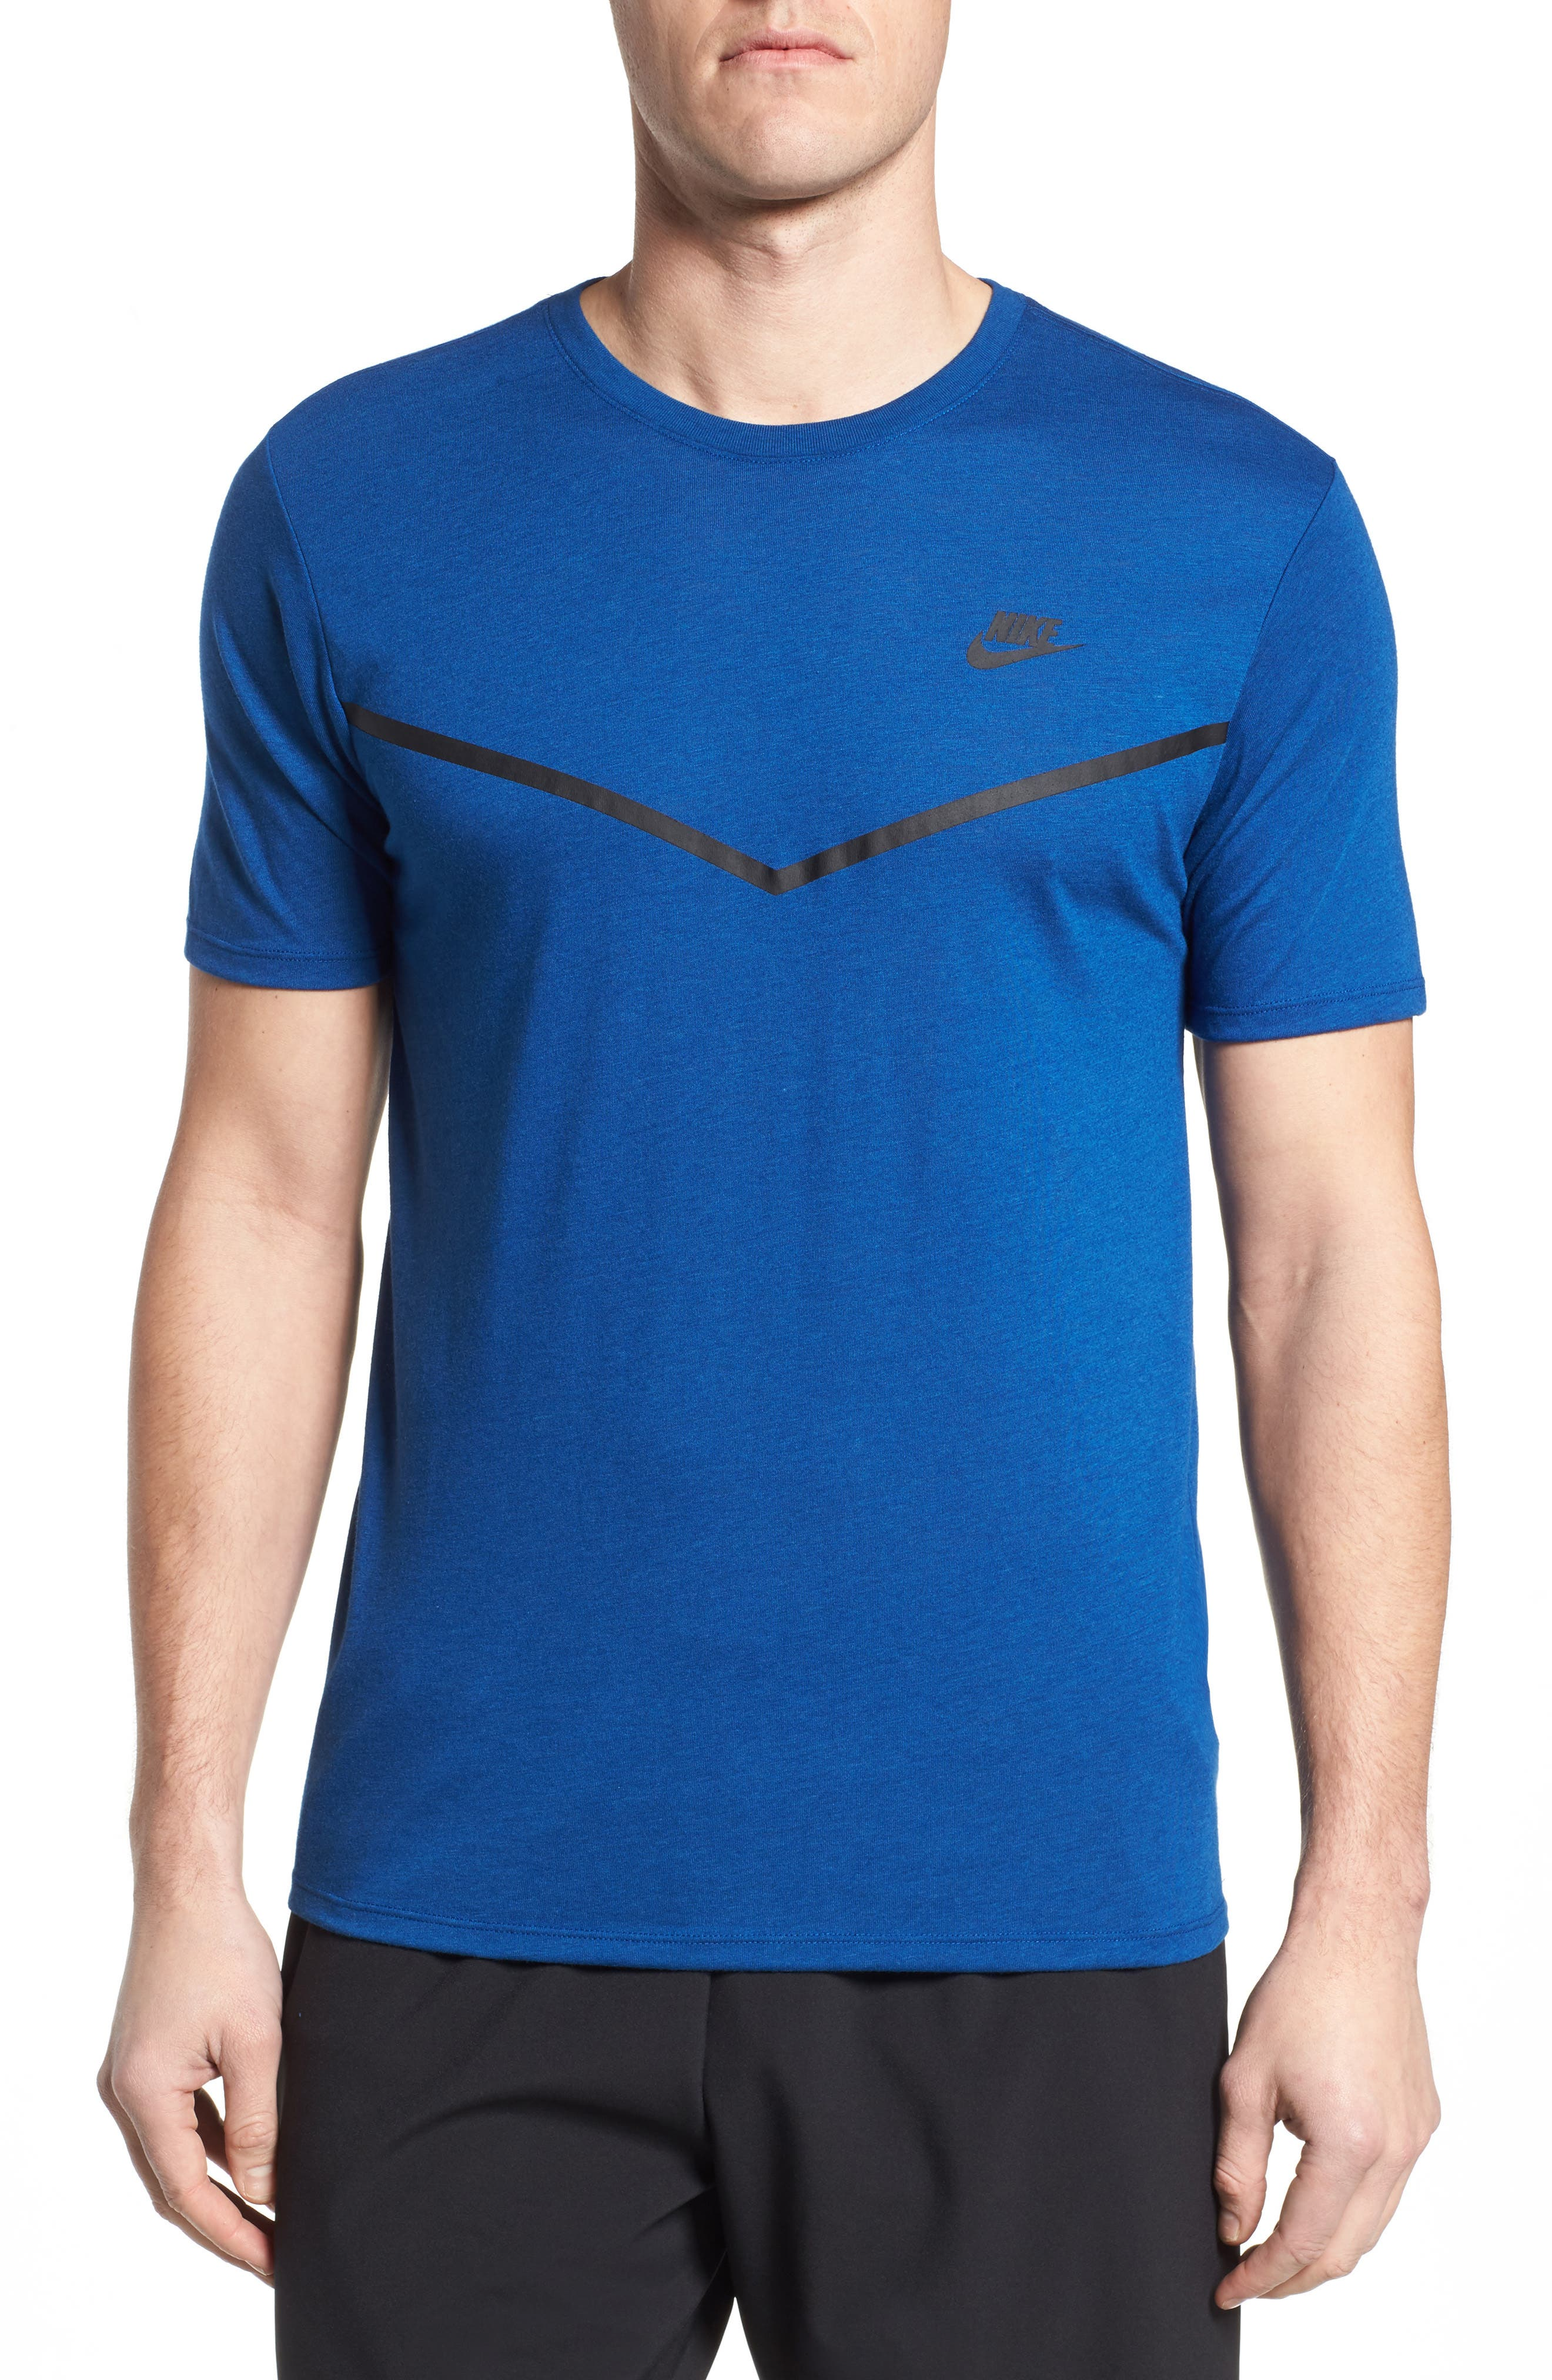 NSW TB Tech T-Shirt,                         Main,                         color, Gym Blue/ Obsidian/ Black